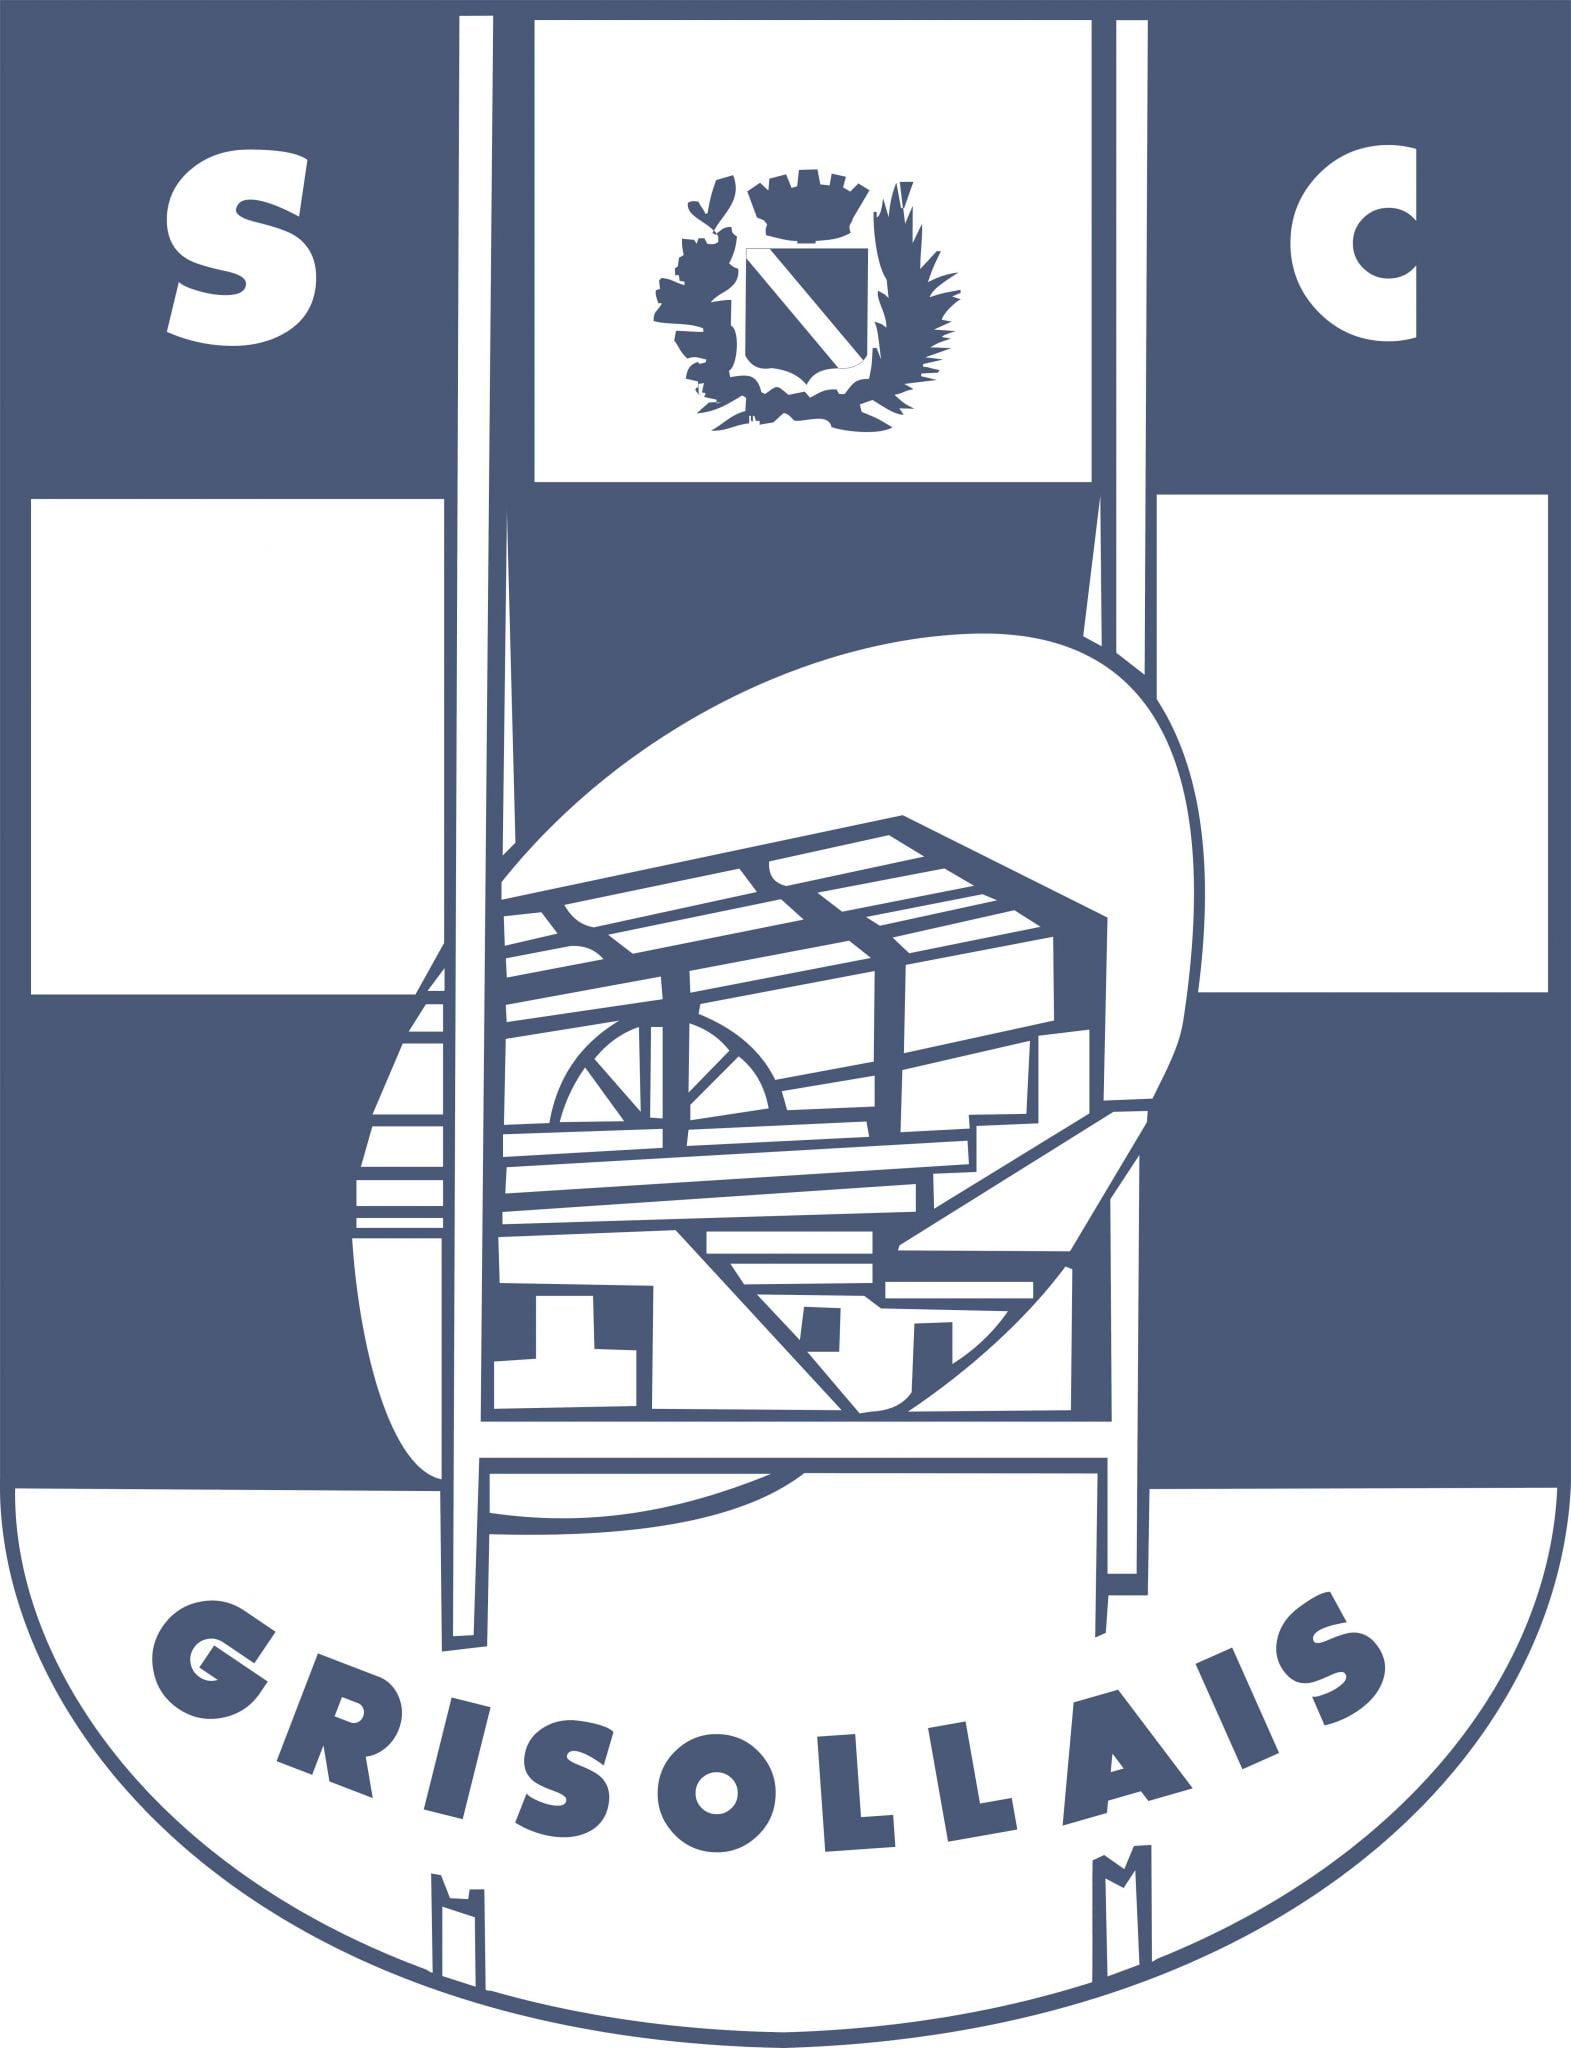 Sporting Club Grisollais